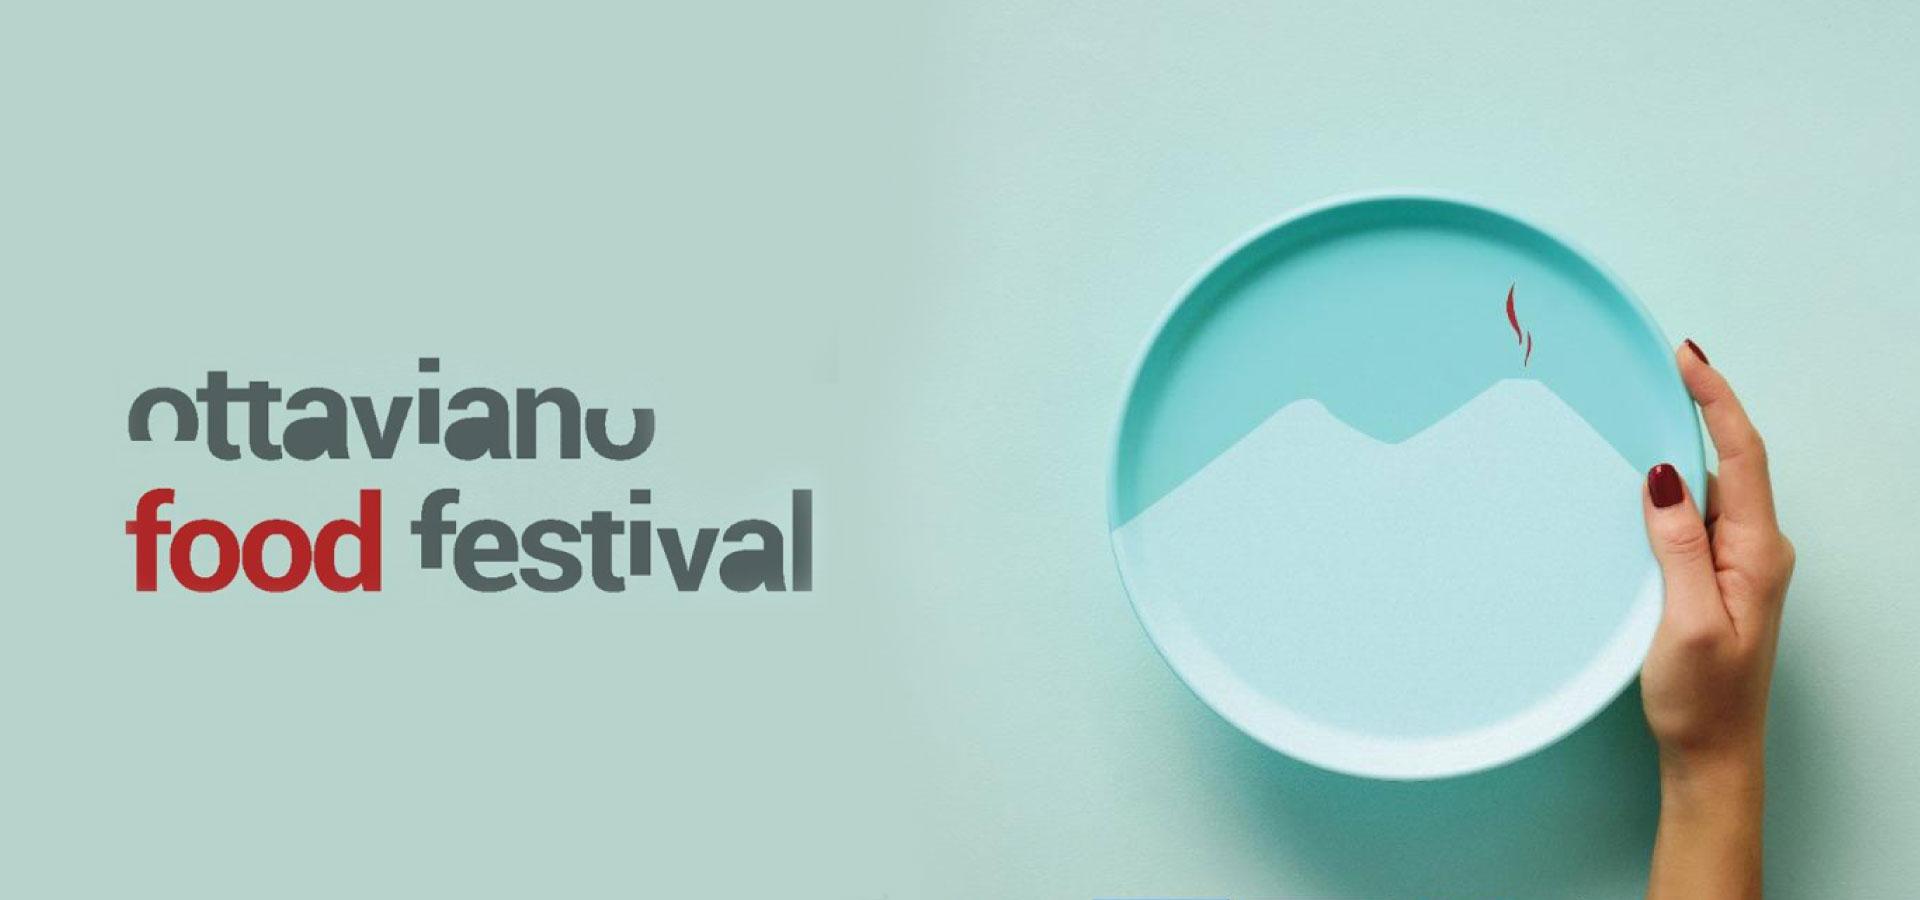 OFF Ottaviano Food Festival 2019